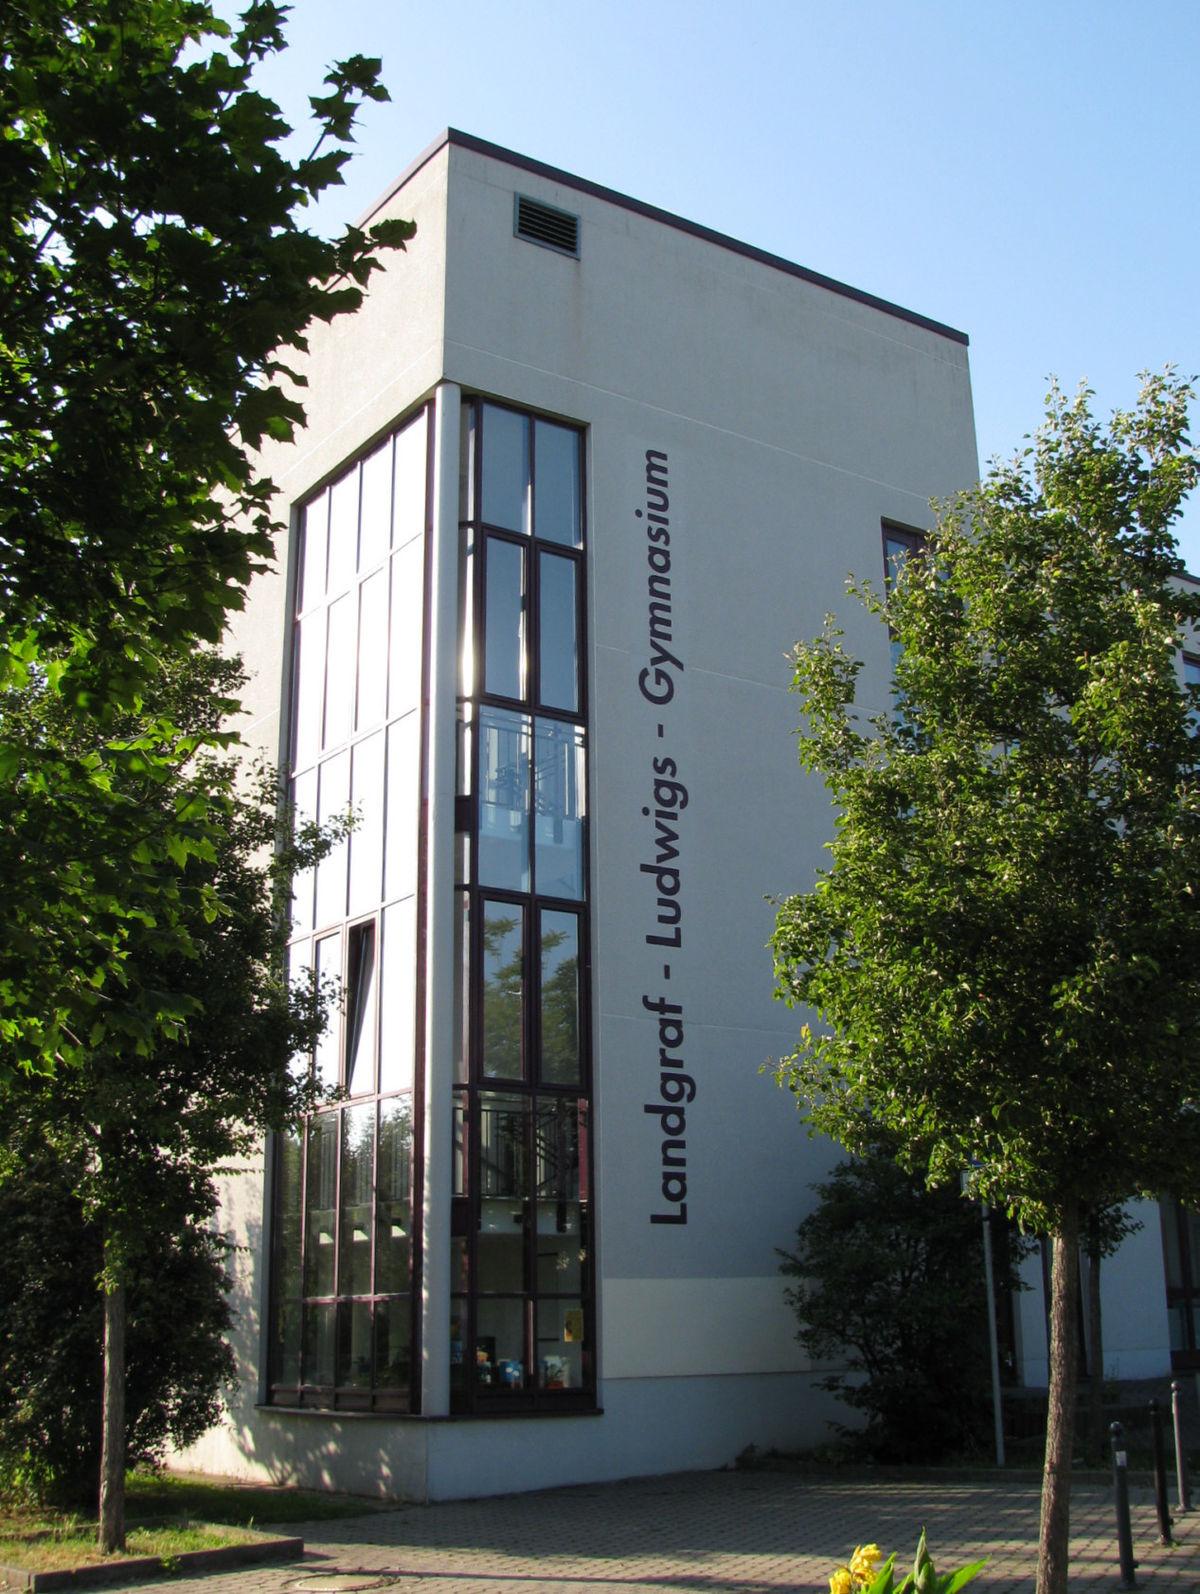 Landgraf Ludwigs Gymnasium Wikipedia